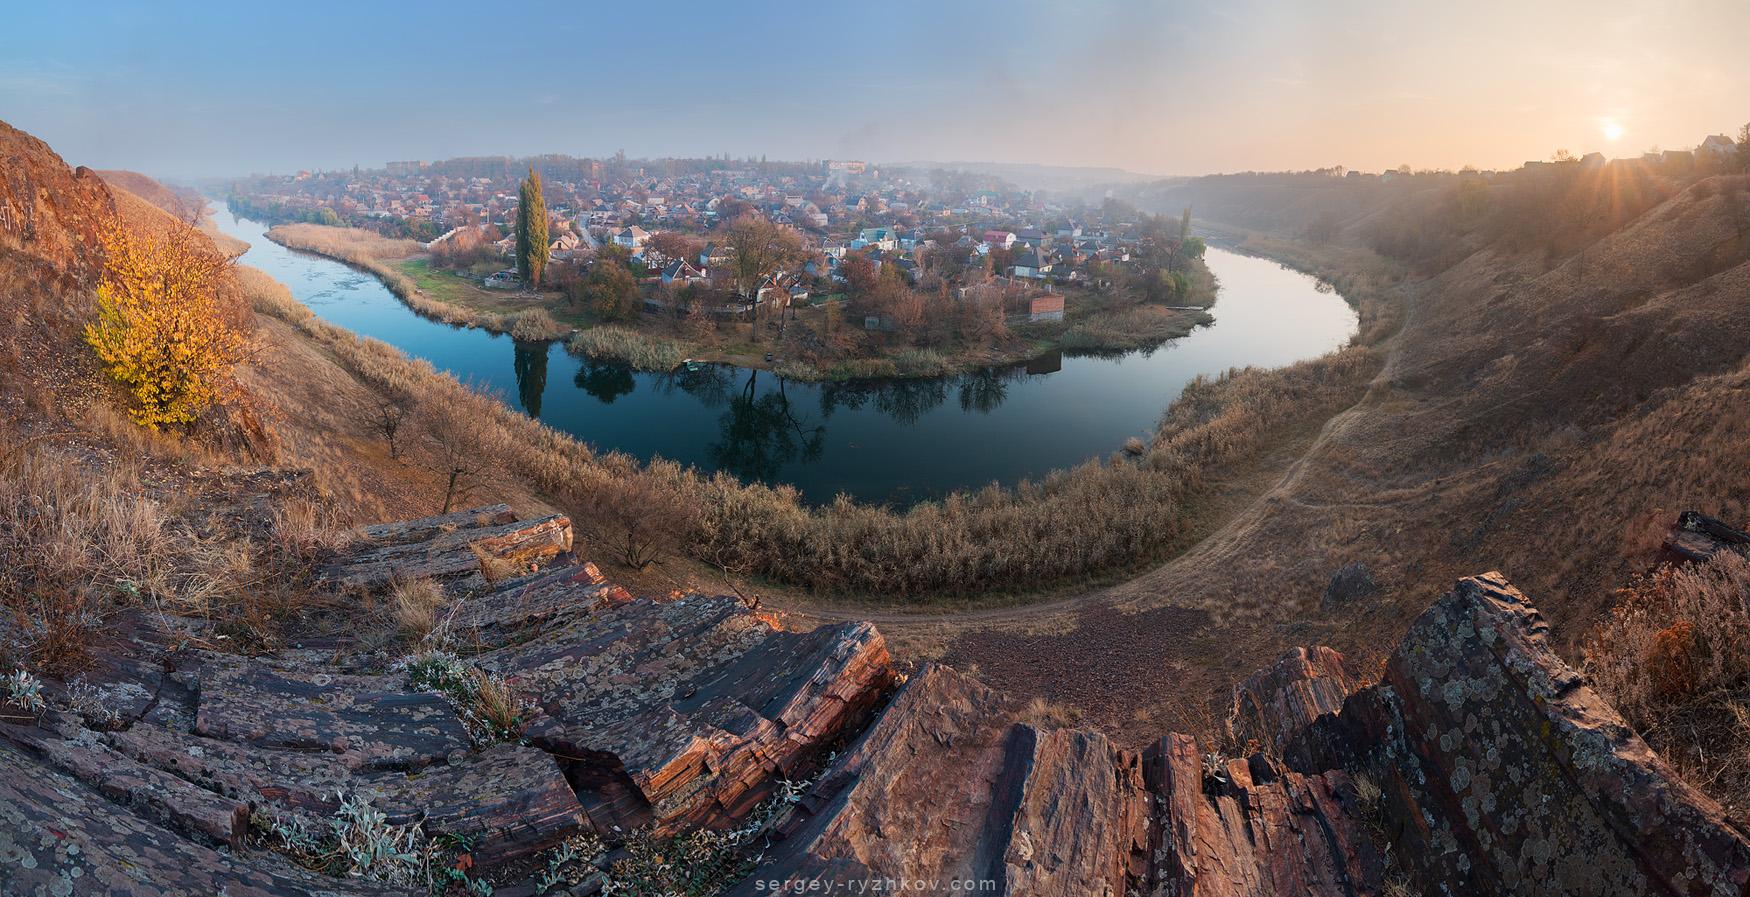 MOPR Rocks, Kryvyi Rih city